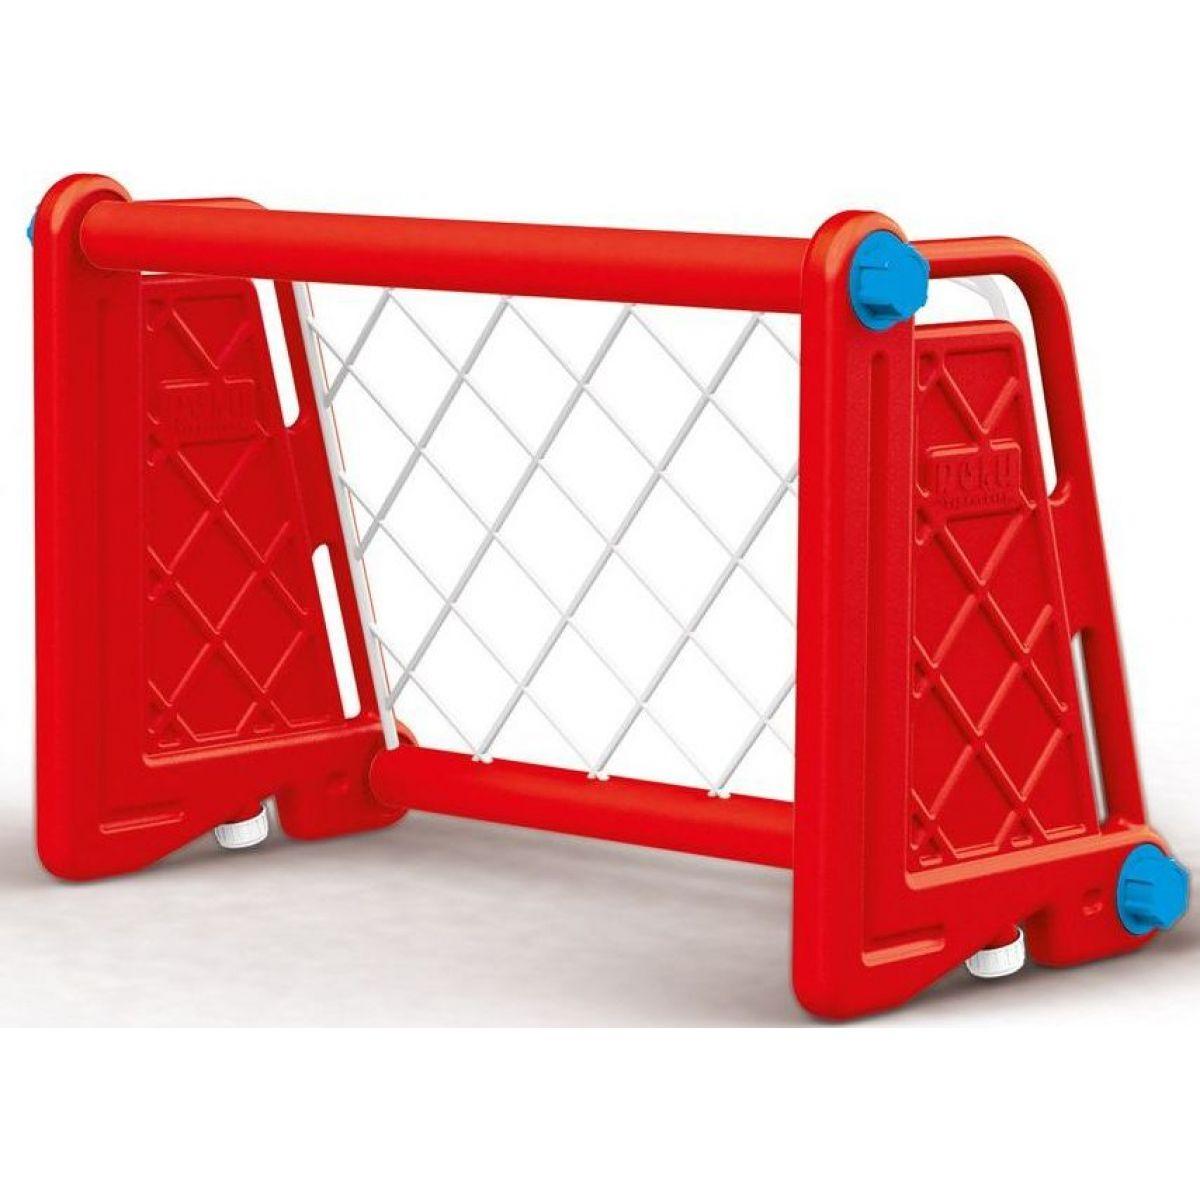 Dolu Detská futbalová bránka